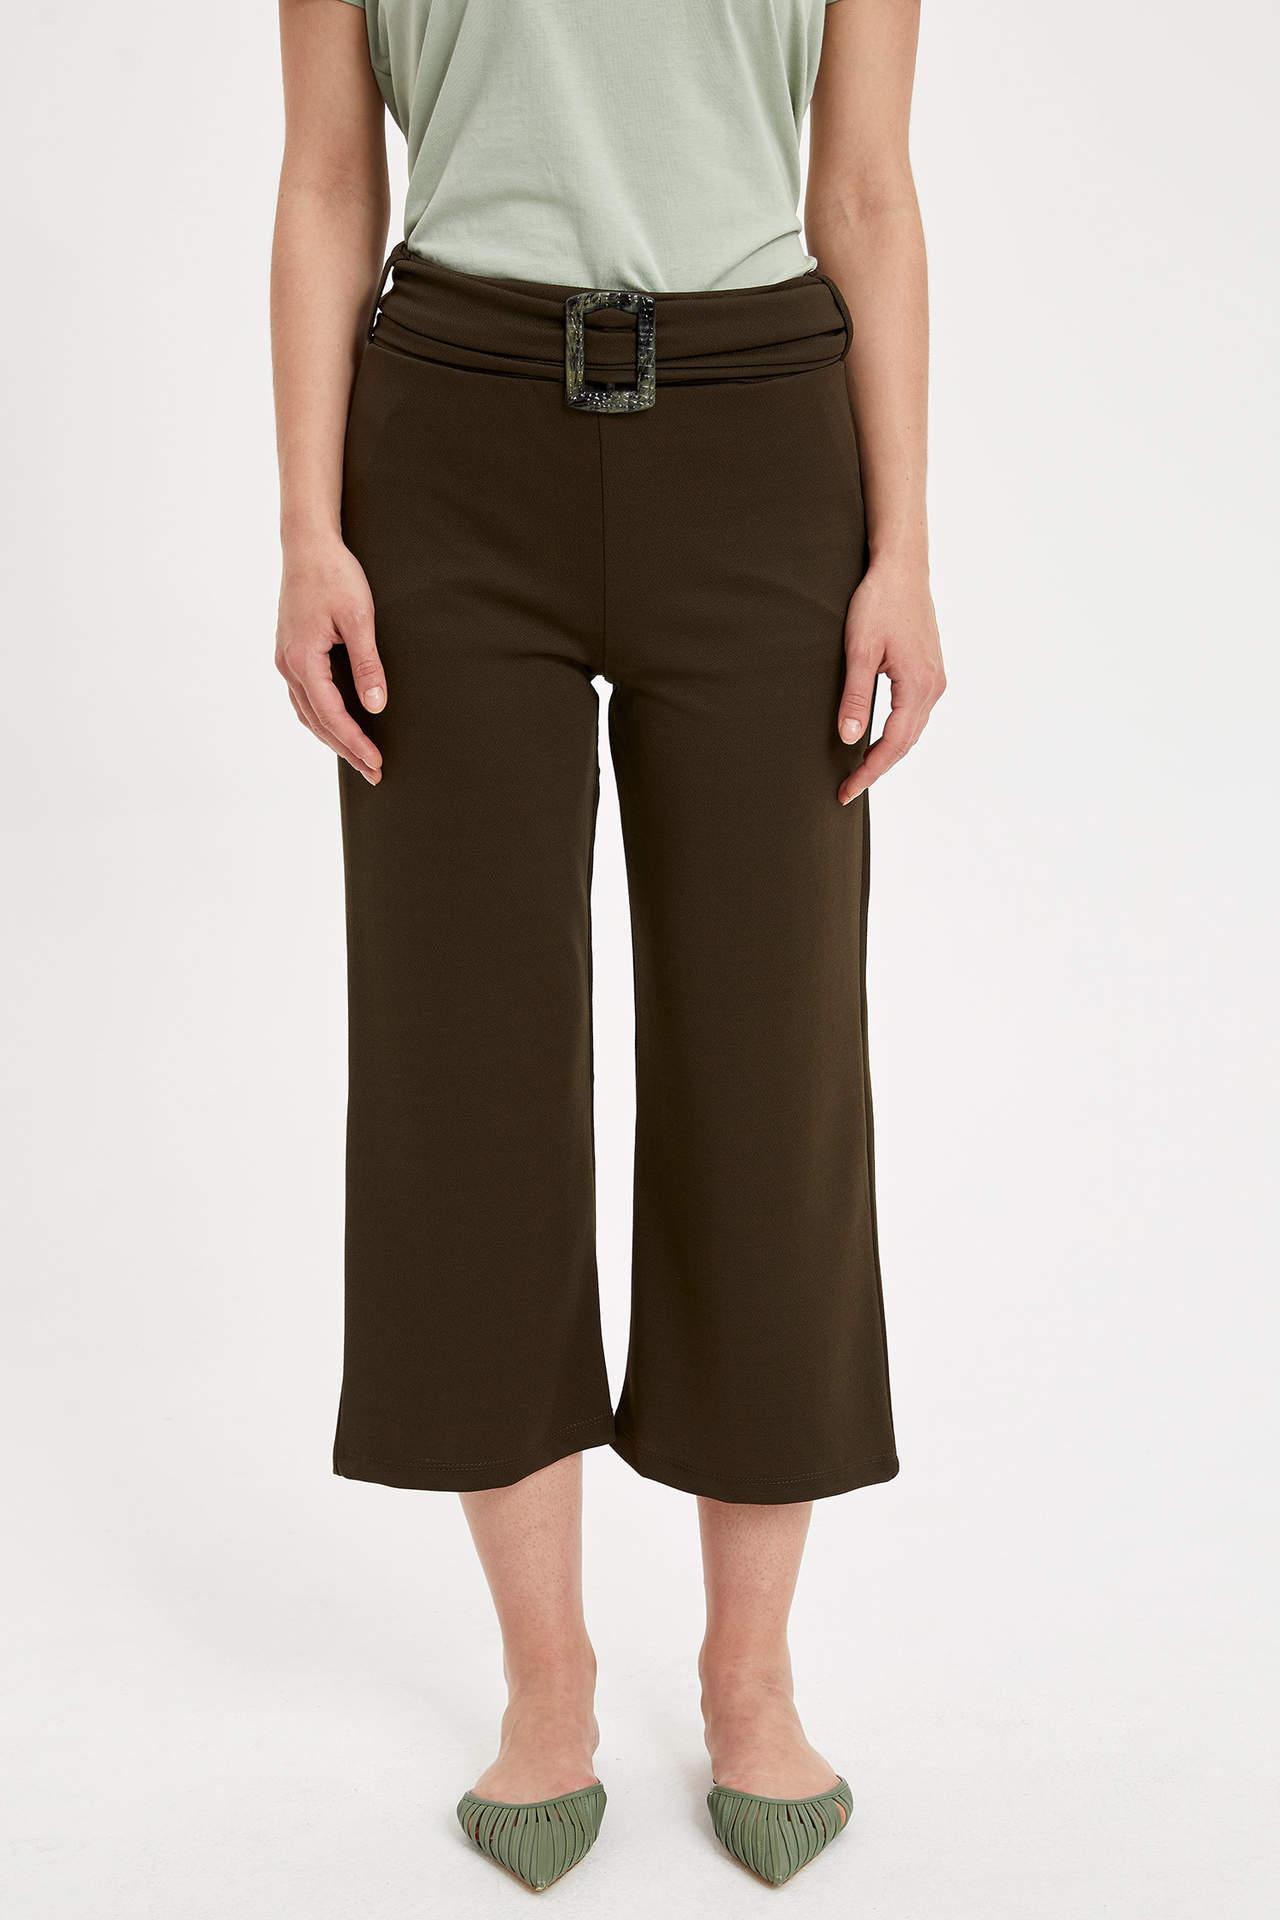 Defacto Kadın Kendinden Kemerli Rahat Pantolon